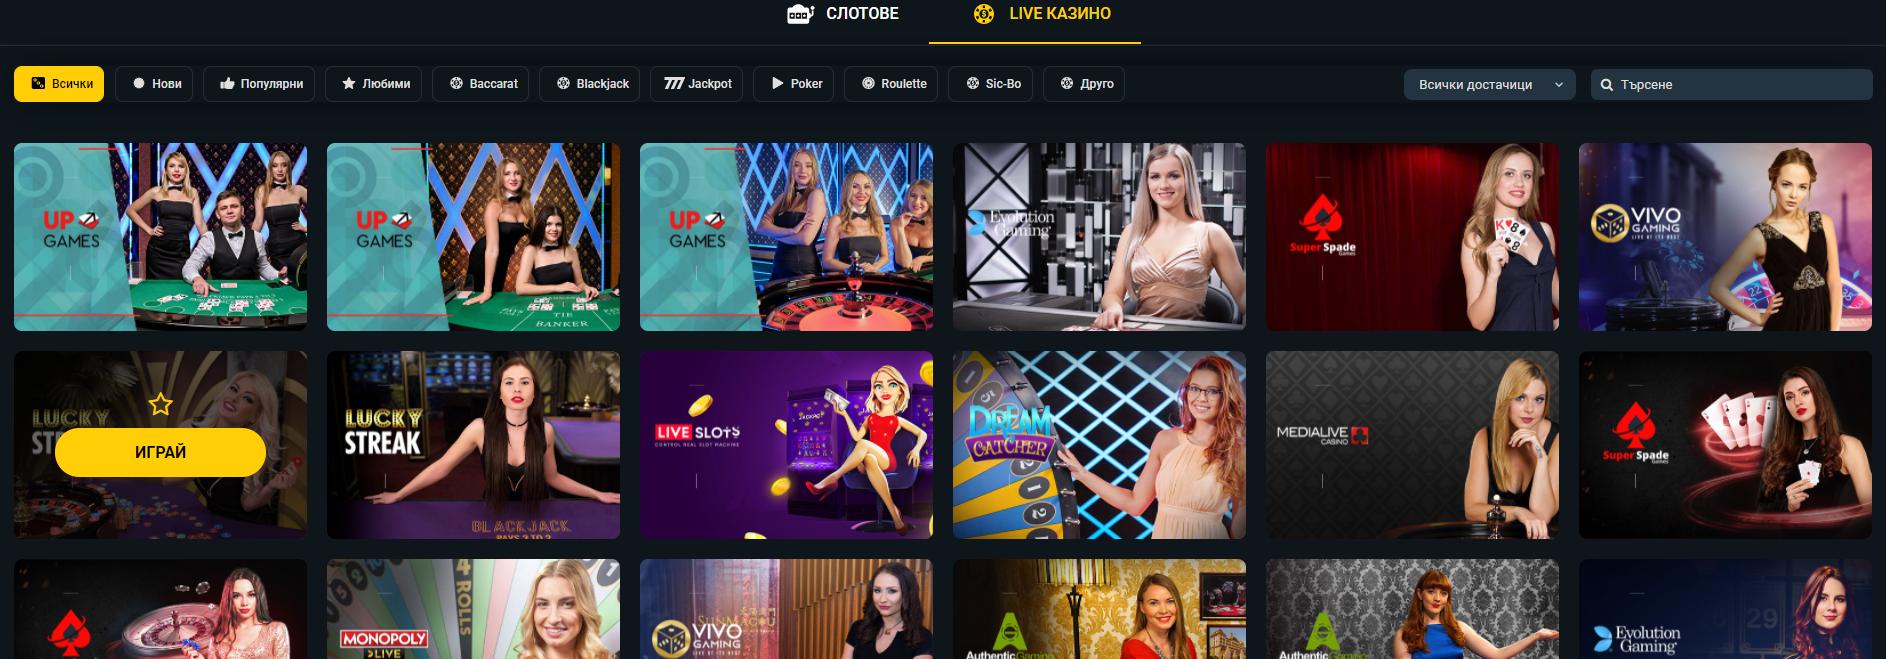 betwinner live casino-komarbet.com